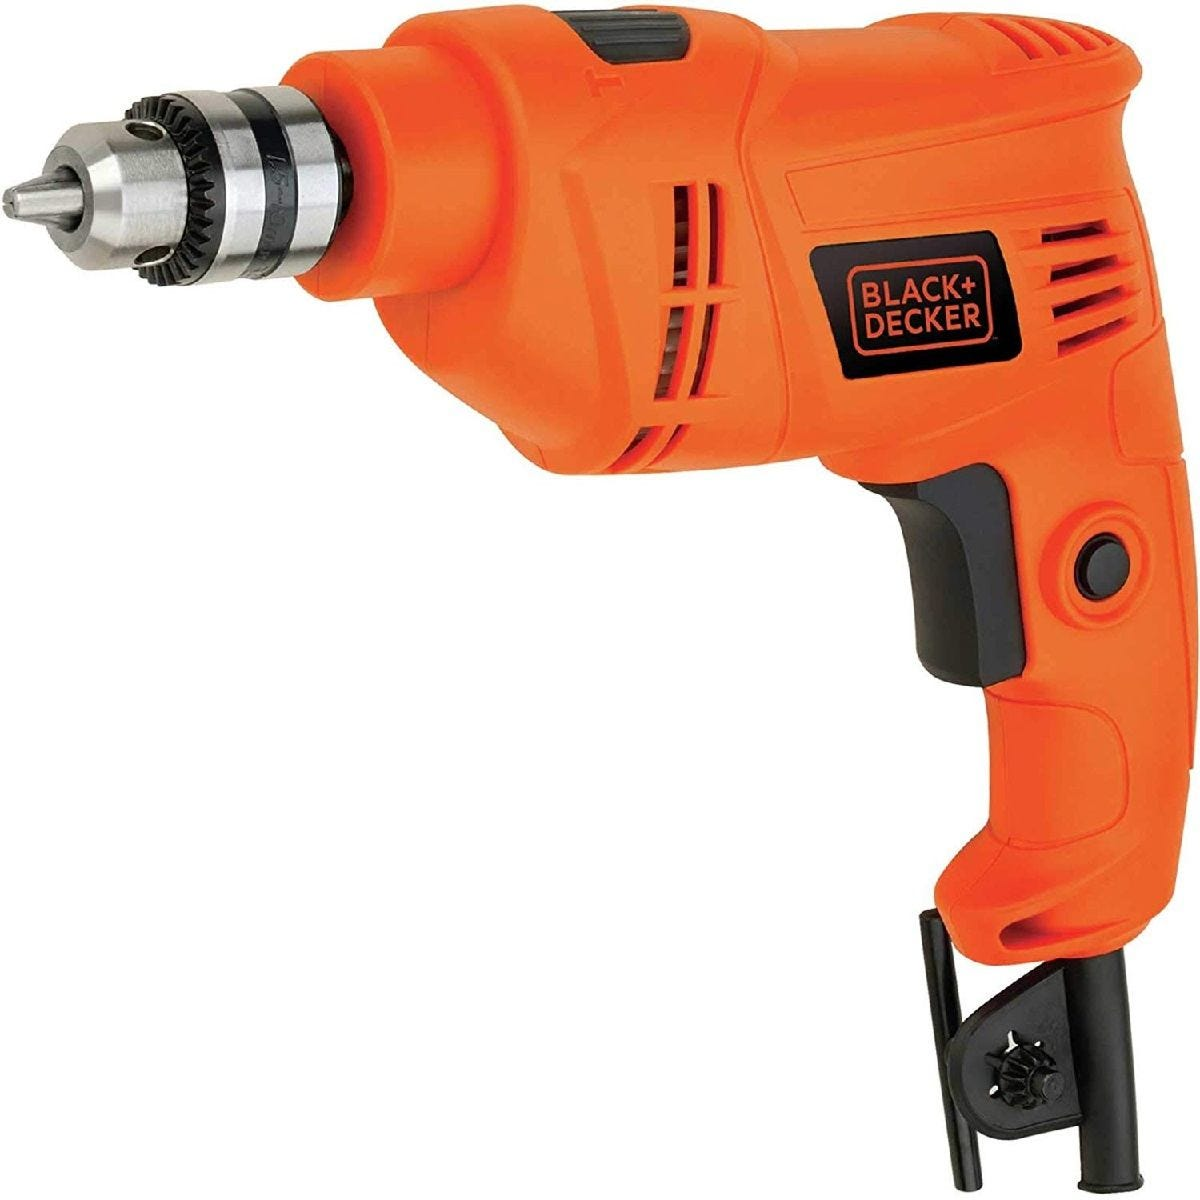 Black & Decker 450W Corded Hammer Drill